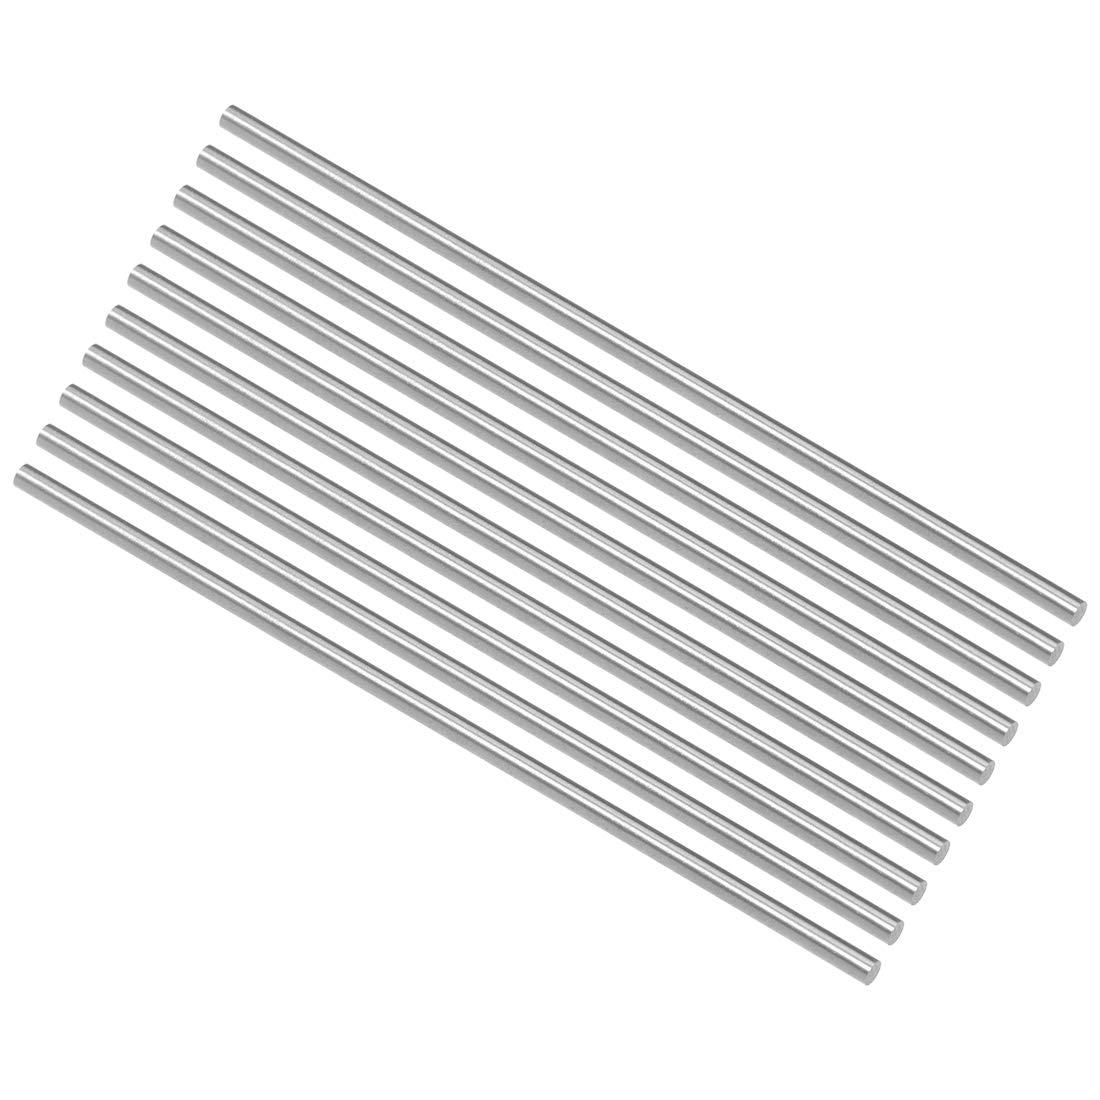 10 Pcs uxcell Round Rod 3mm Diameter 100mm Length HSS Lathe Bar Stock for Shaft Miniature Axle DIY Craft Tool